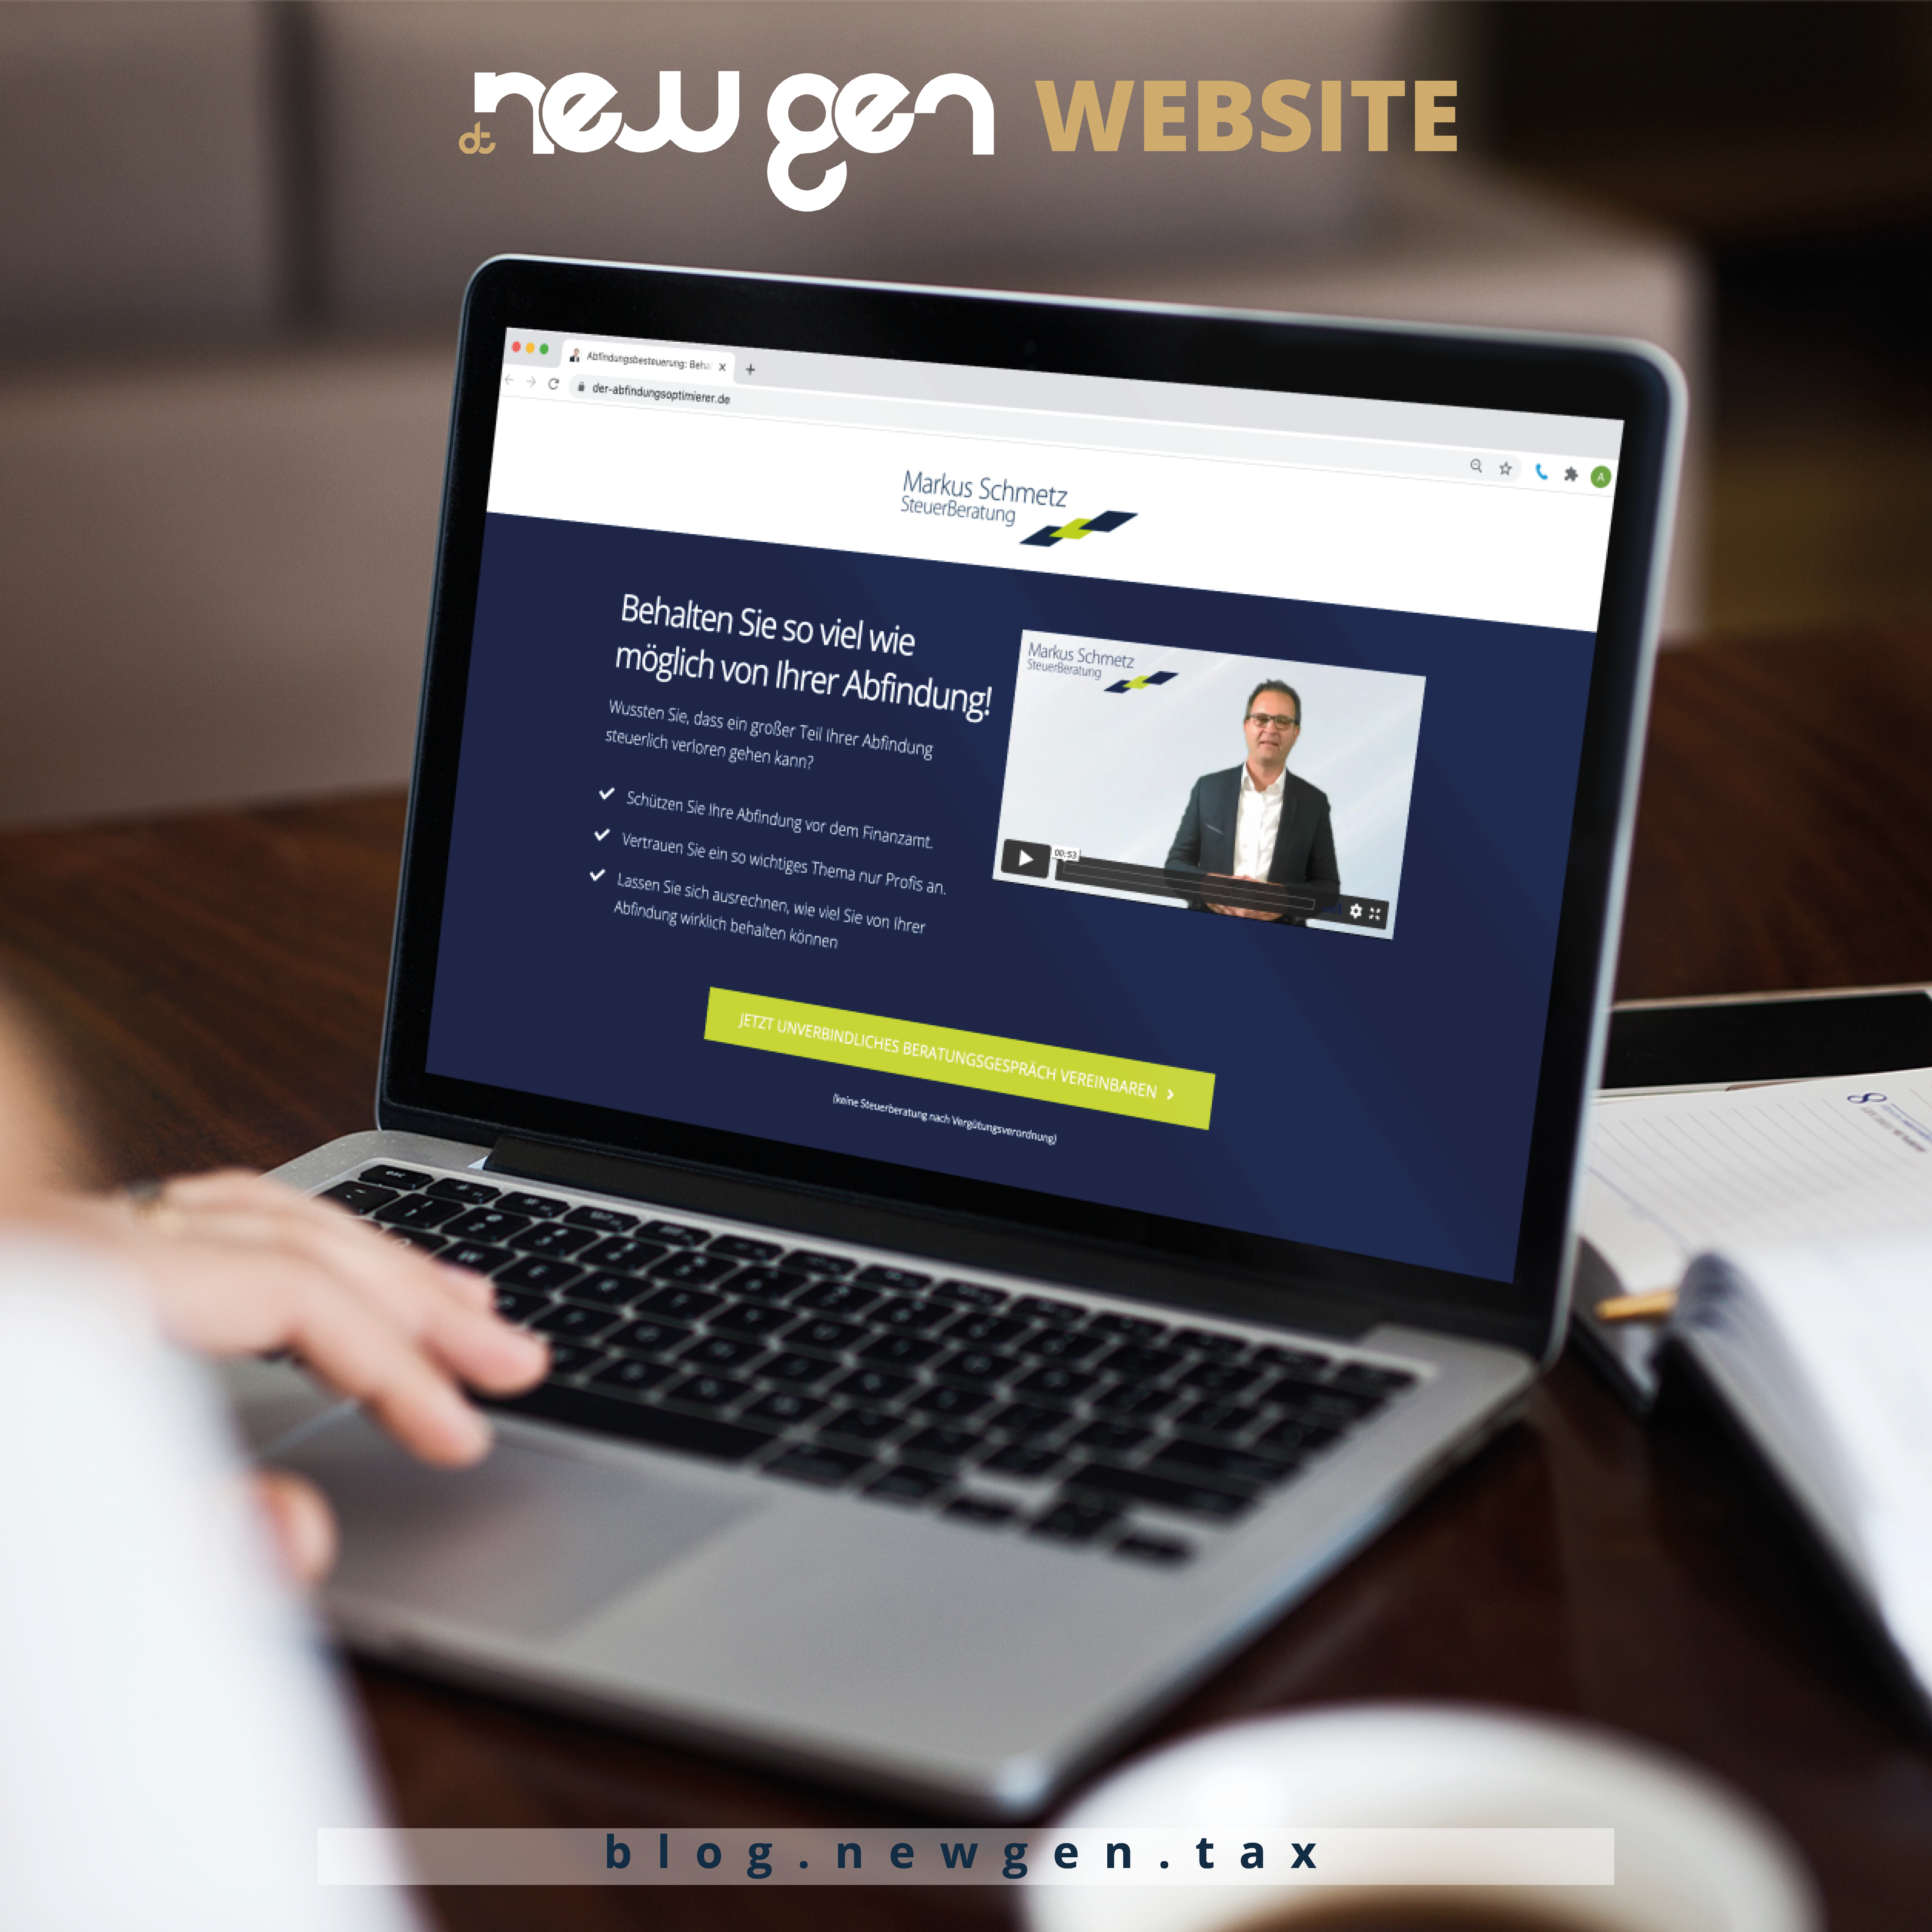 new gen Website - Markus Schmetz